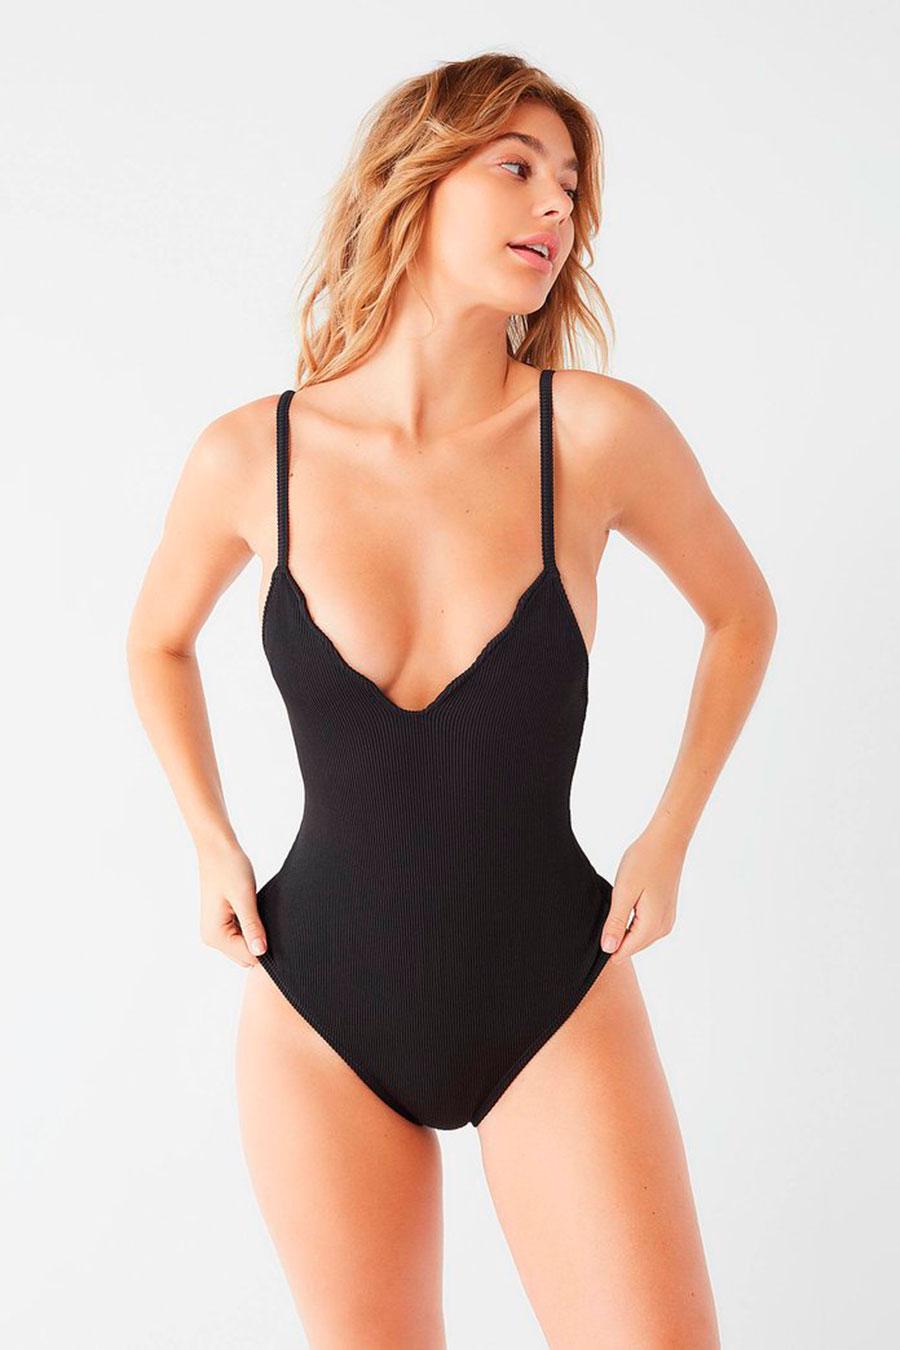 872ae051f78 bañadores-biquinis-poco-pecho-urban-outfitters. Bañadores mujer con cuello